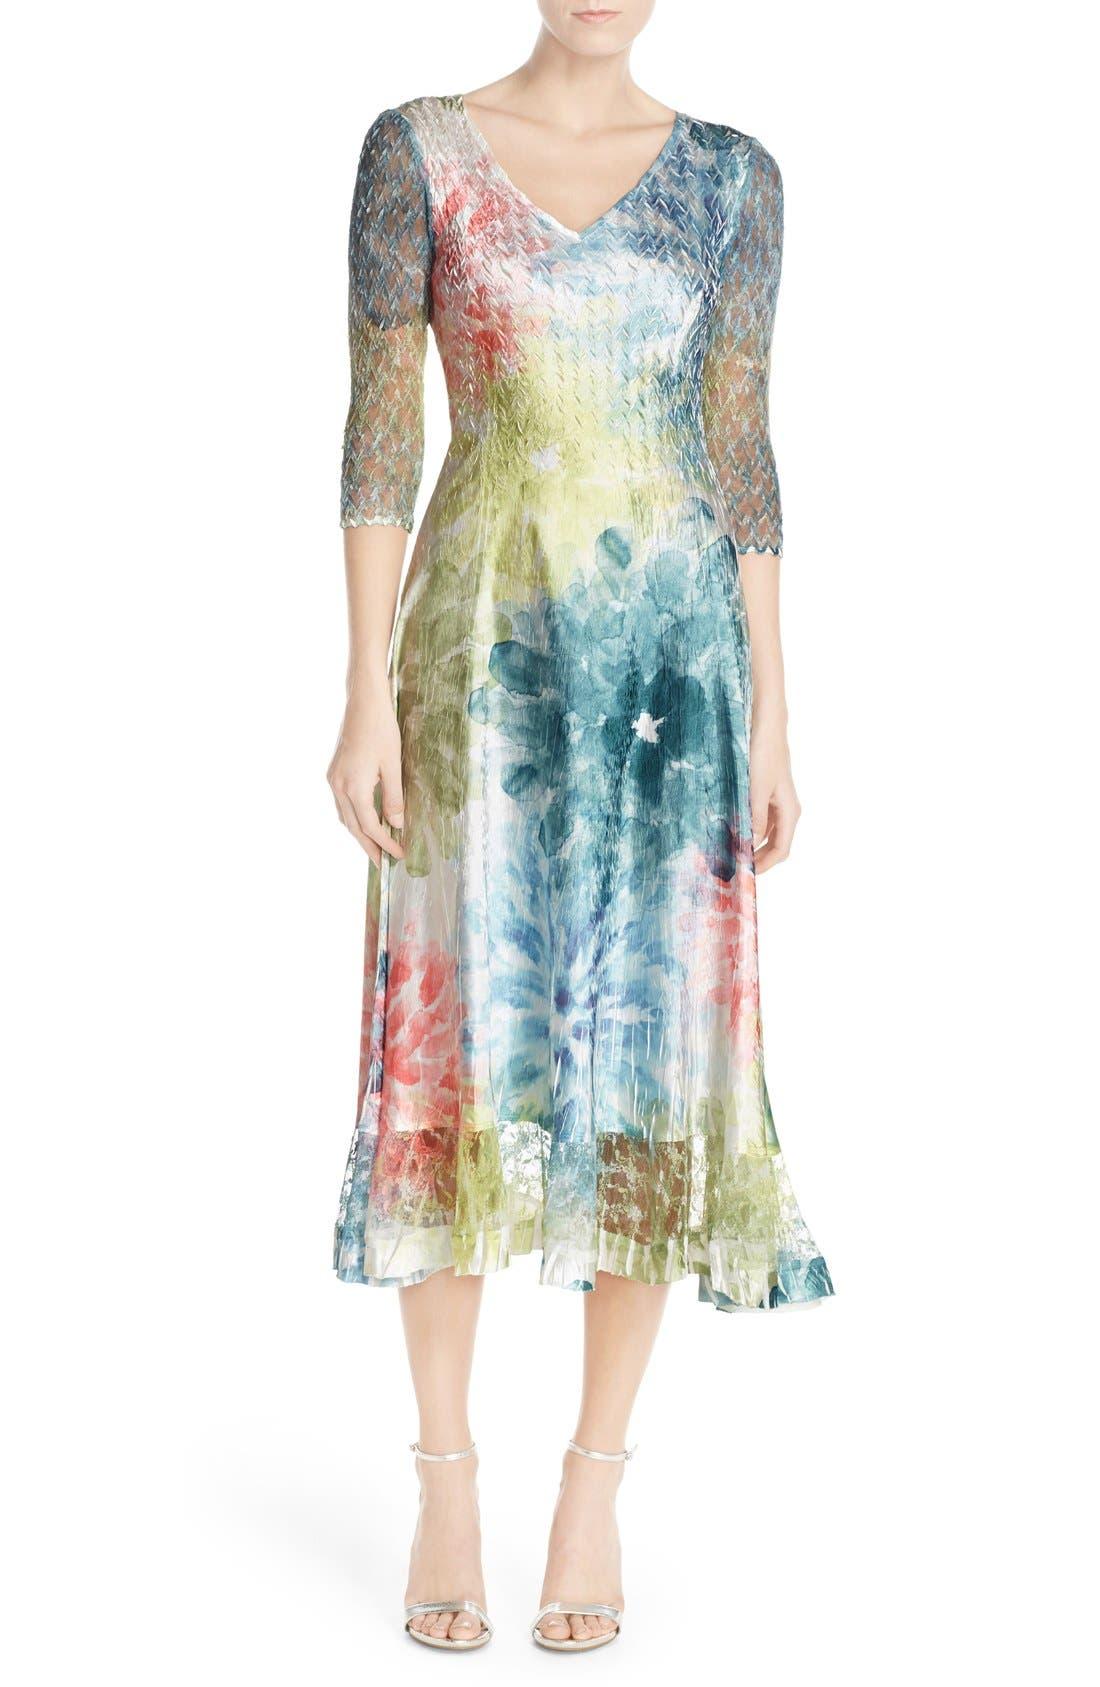 Main Image - Komarov Mixed Media A-Line Dress (Regular & Petite)